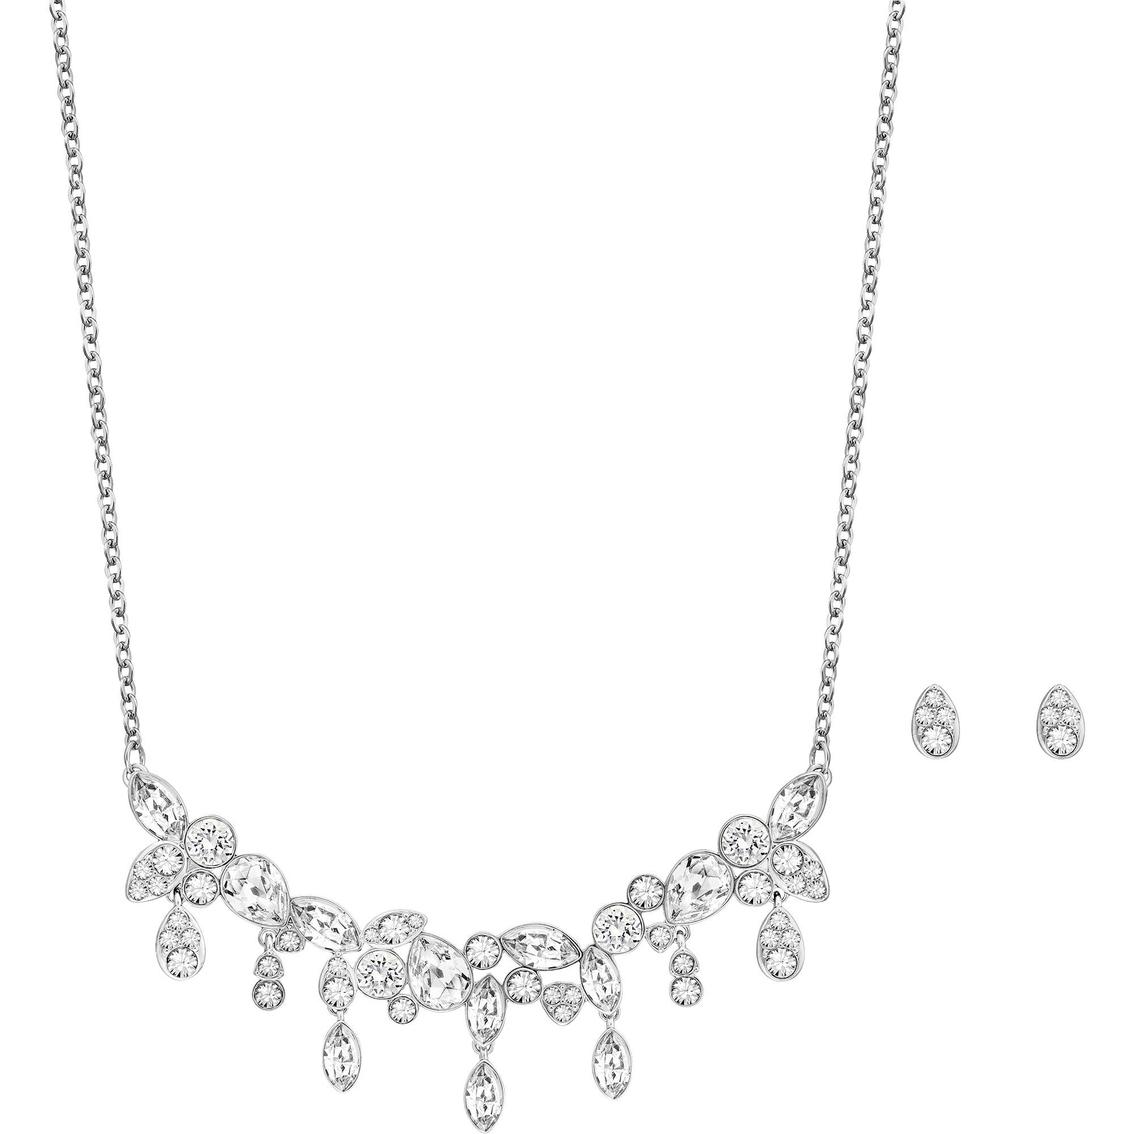 f60862c22 Swarovski Diapason Necklace And Stud Earrings Set | Crystal Jewelry ...